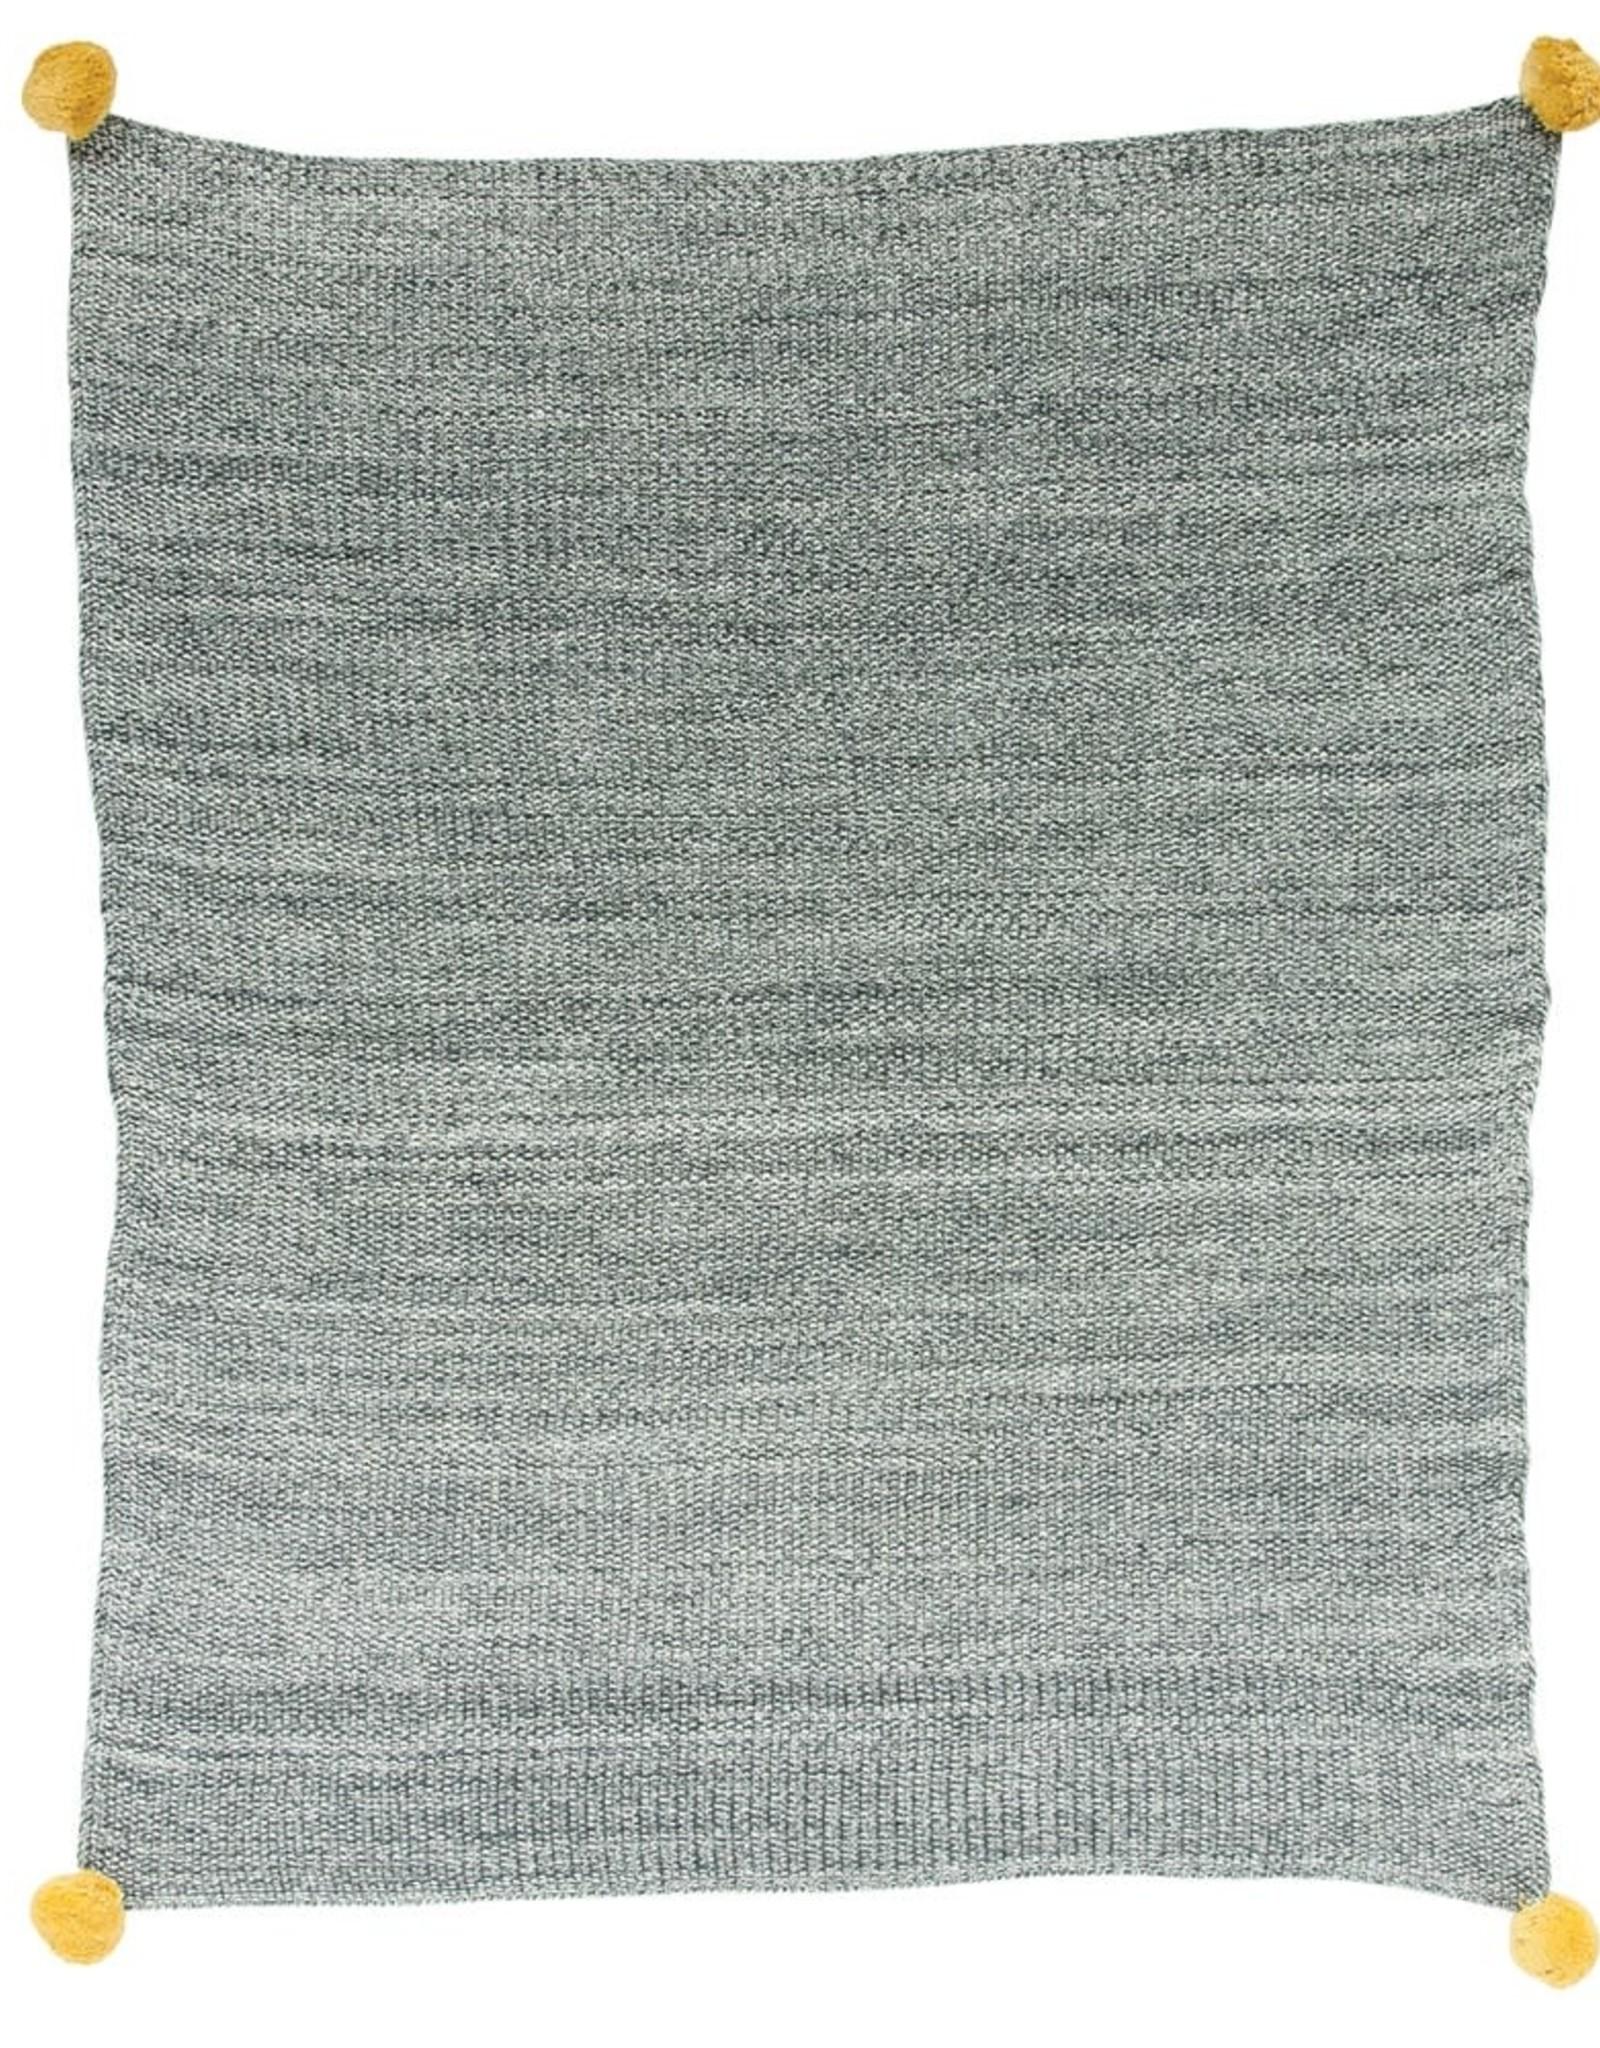 Dark Grey and Yellow Baby Blanket